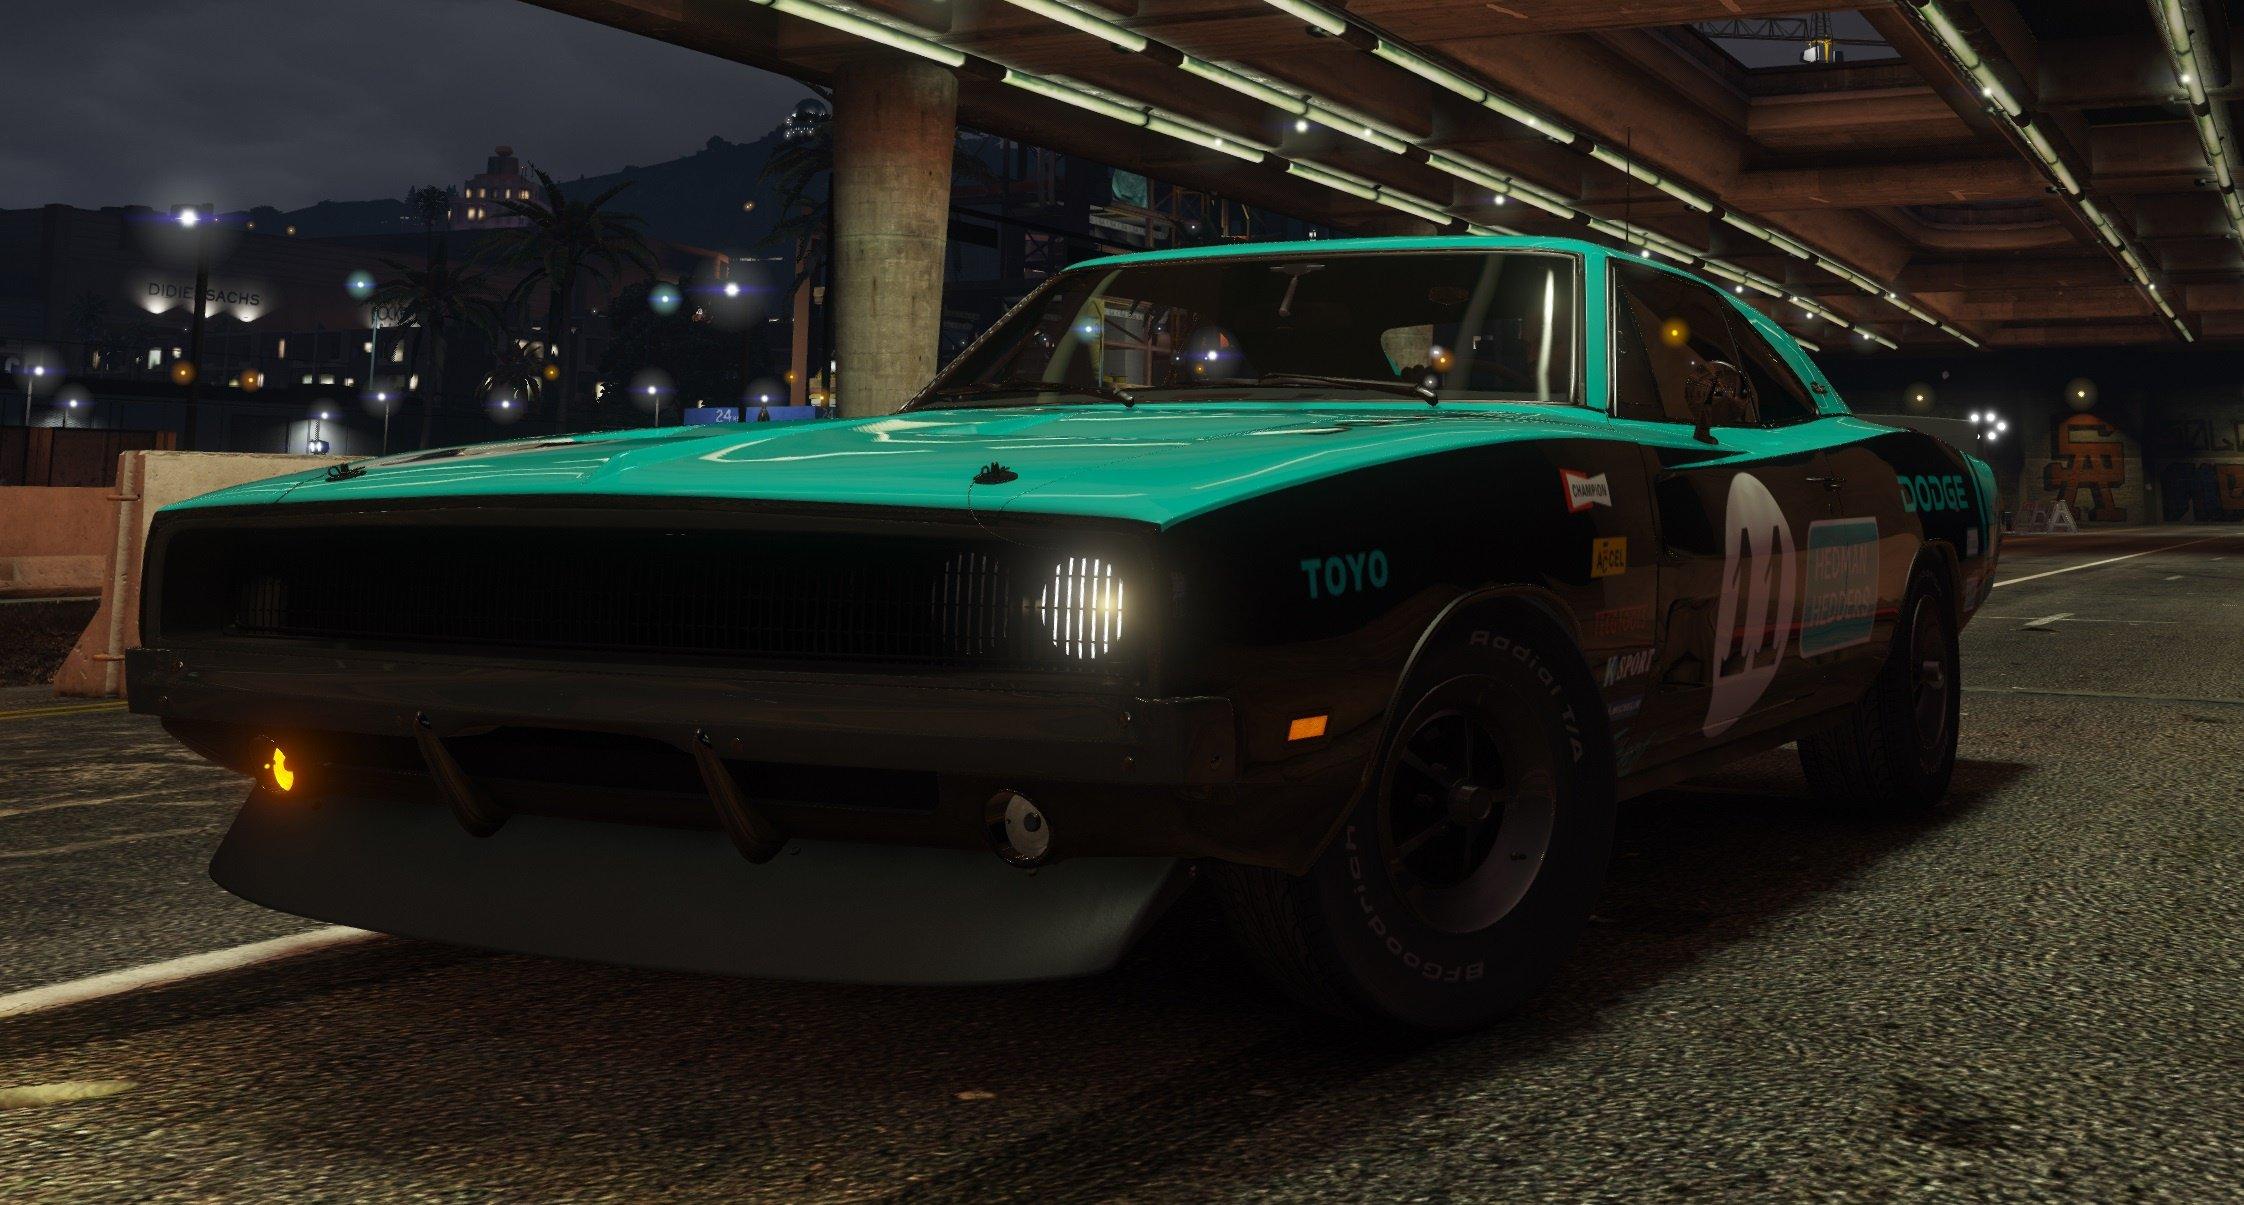 1969 Dodge Charger R/T для GTA V - Скриншот 2